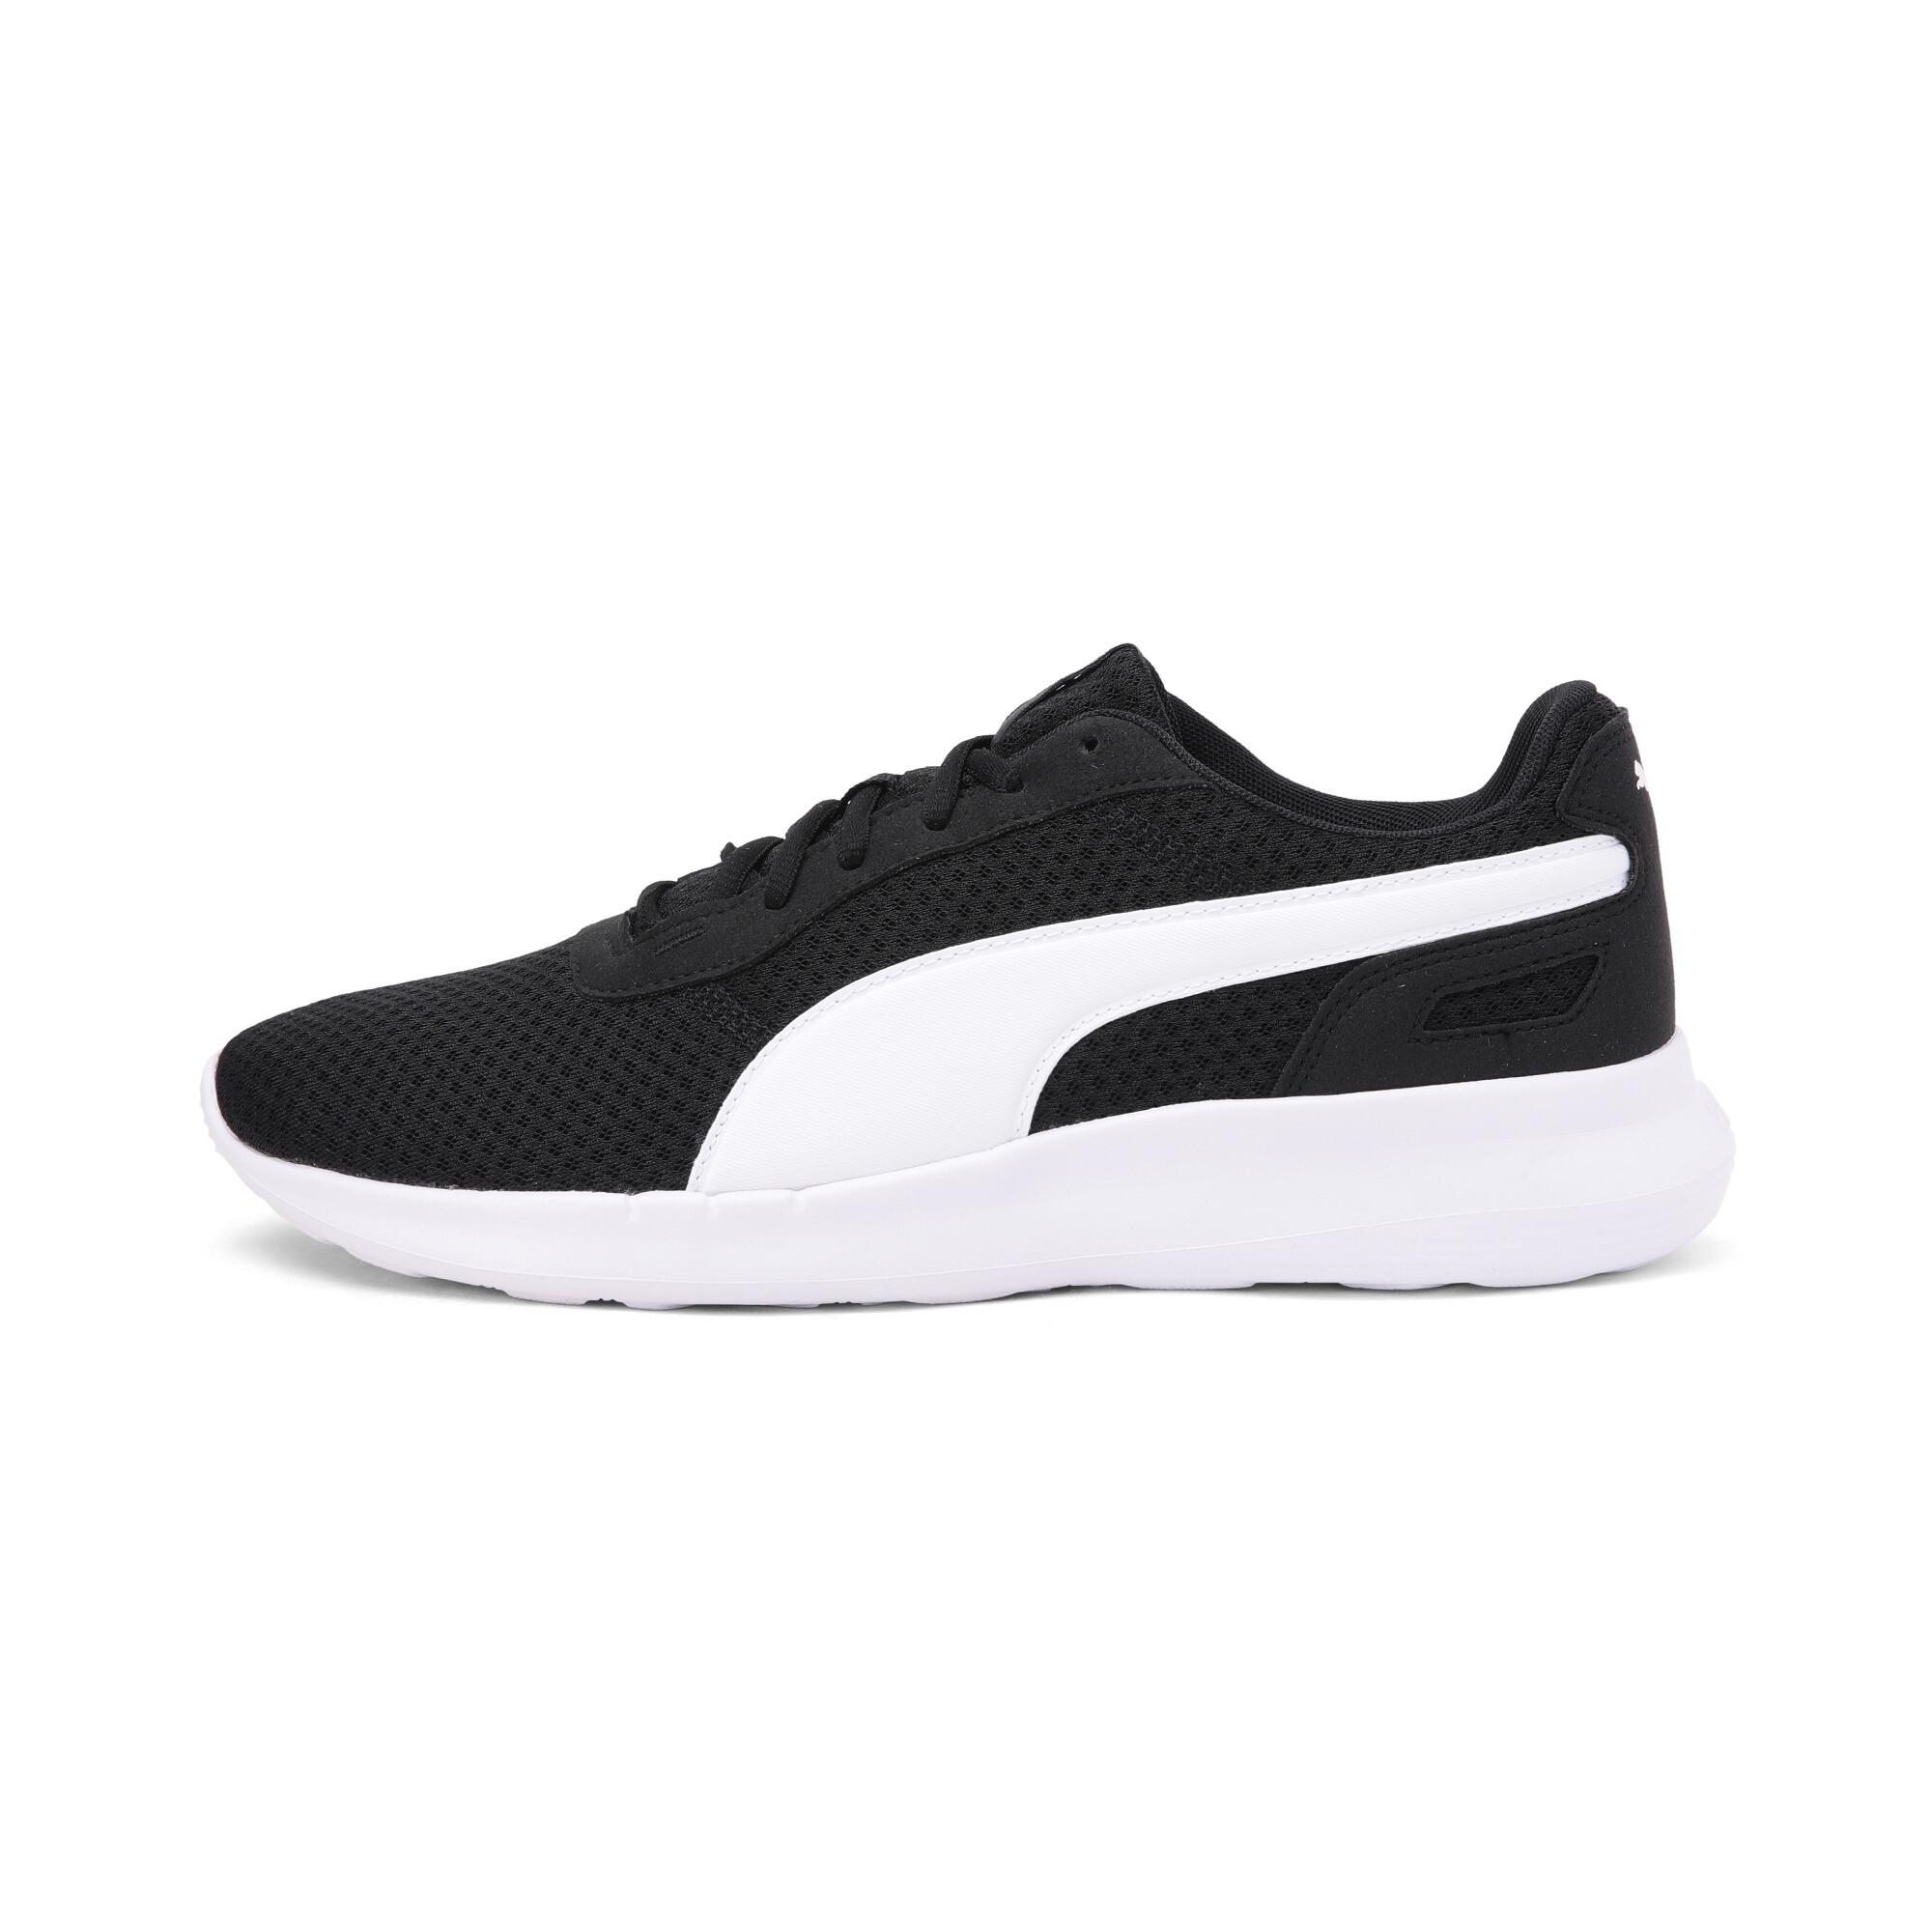 PUMA-Men-039-s-ST-Activate-Sneakers thumbnail 9